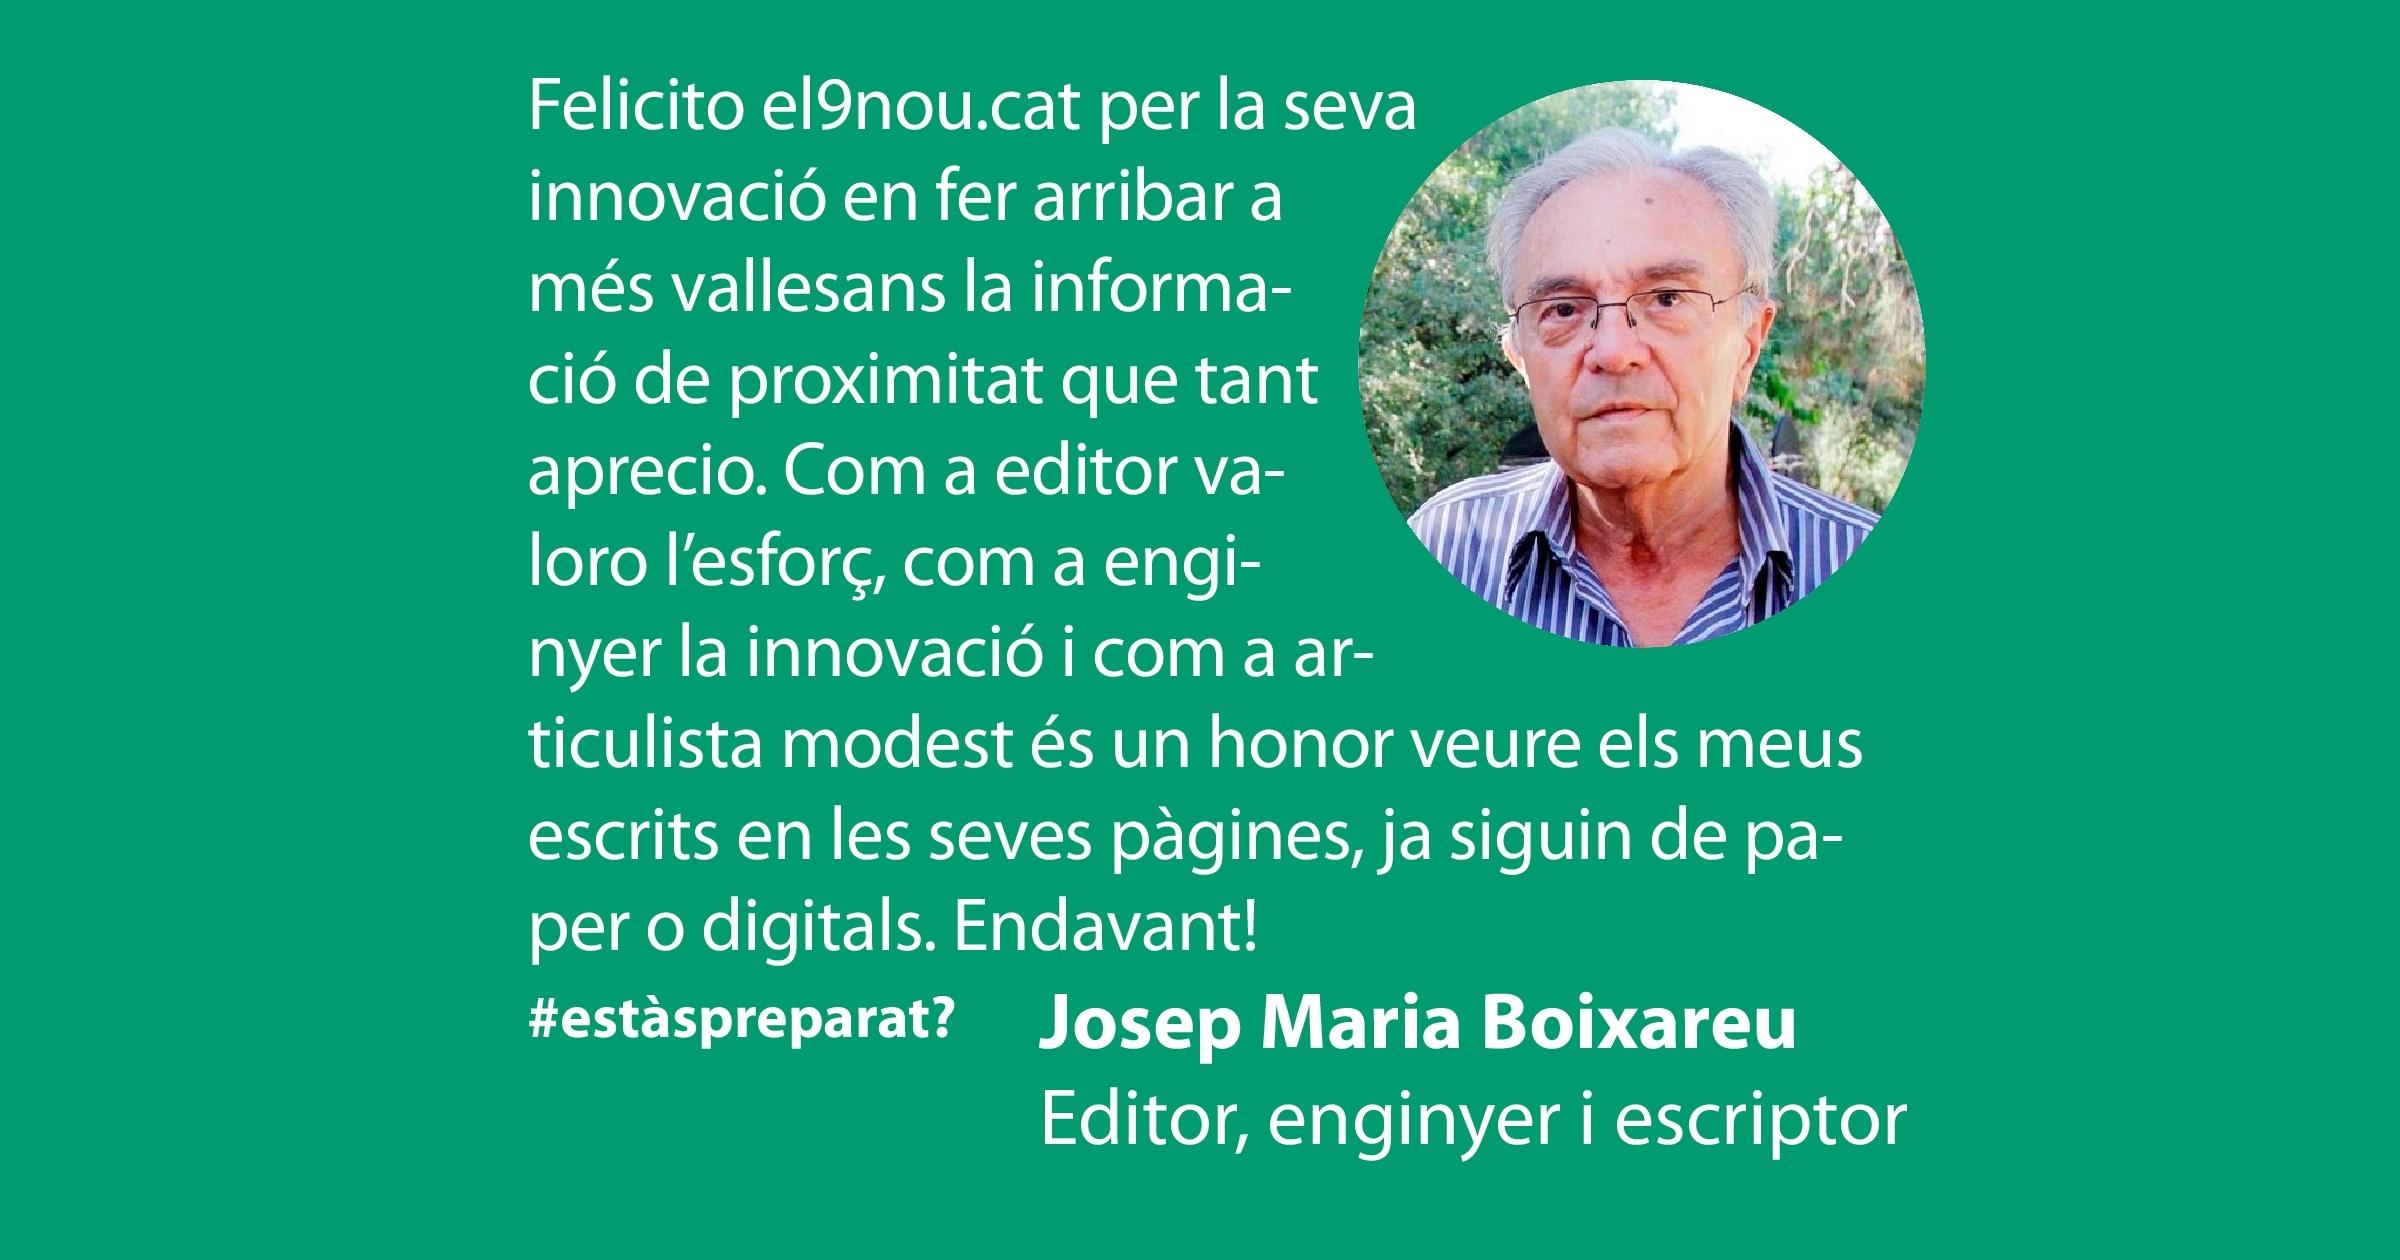 161006_BoixareuSalutacio-001